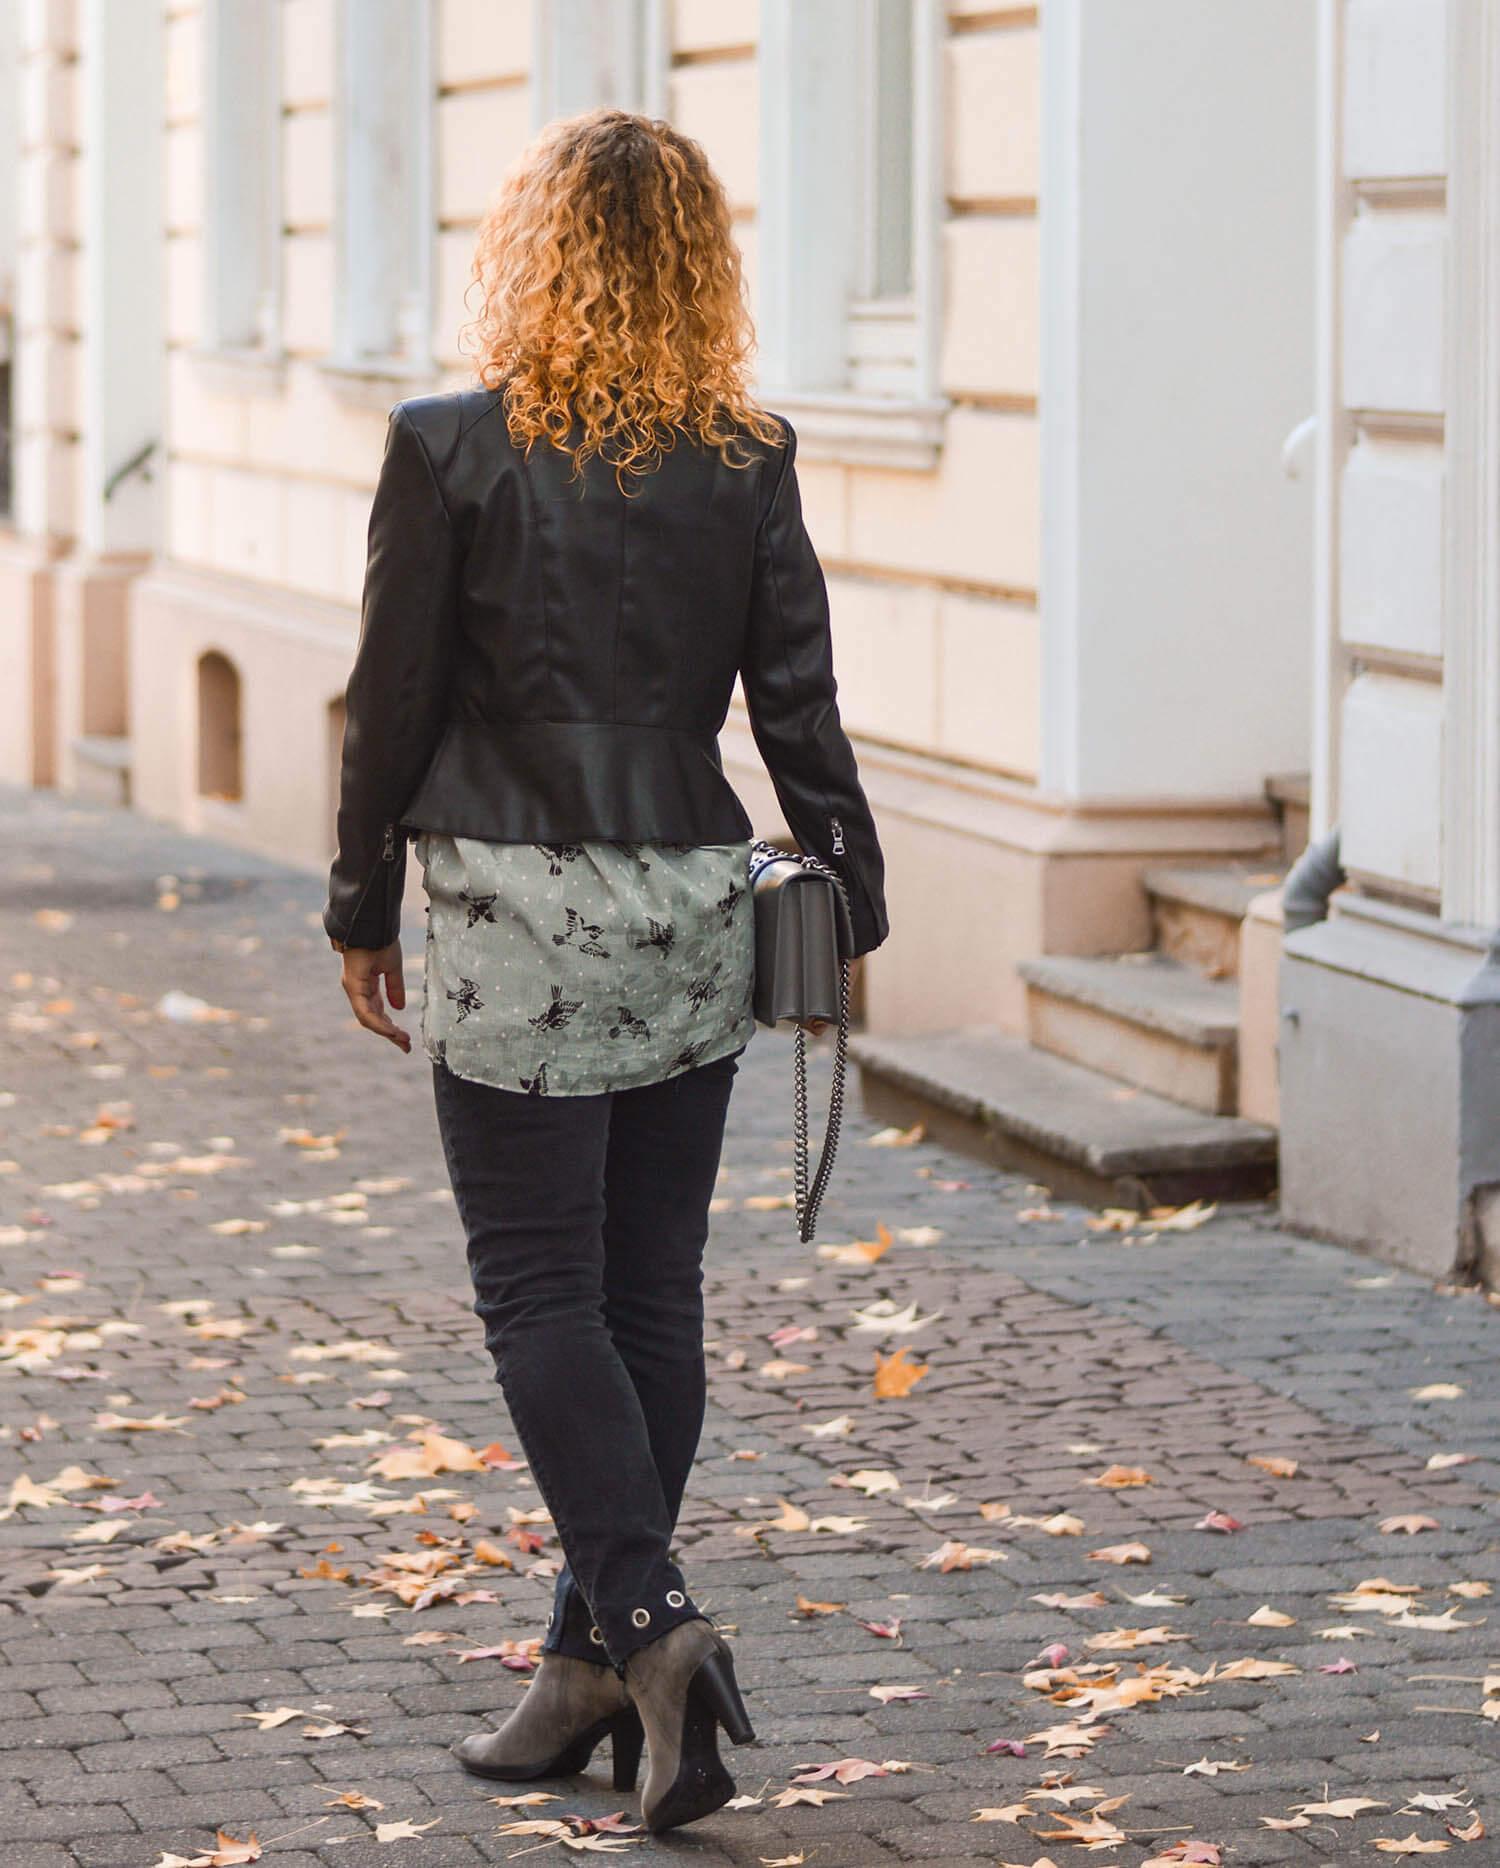 Leather-Jacket-Weather-Zara-Blouse-Rivet-Denim-Fall-Outfit-kationette-fashionblogger-germany